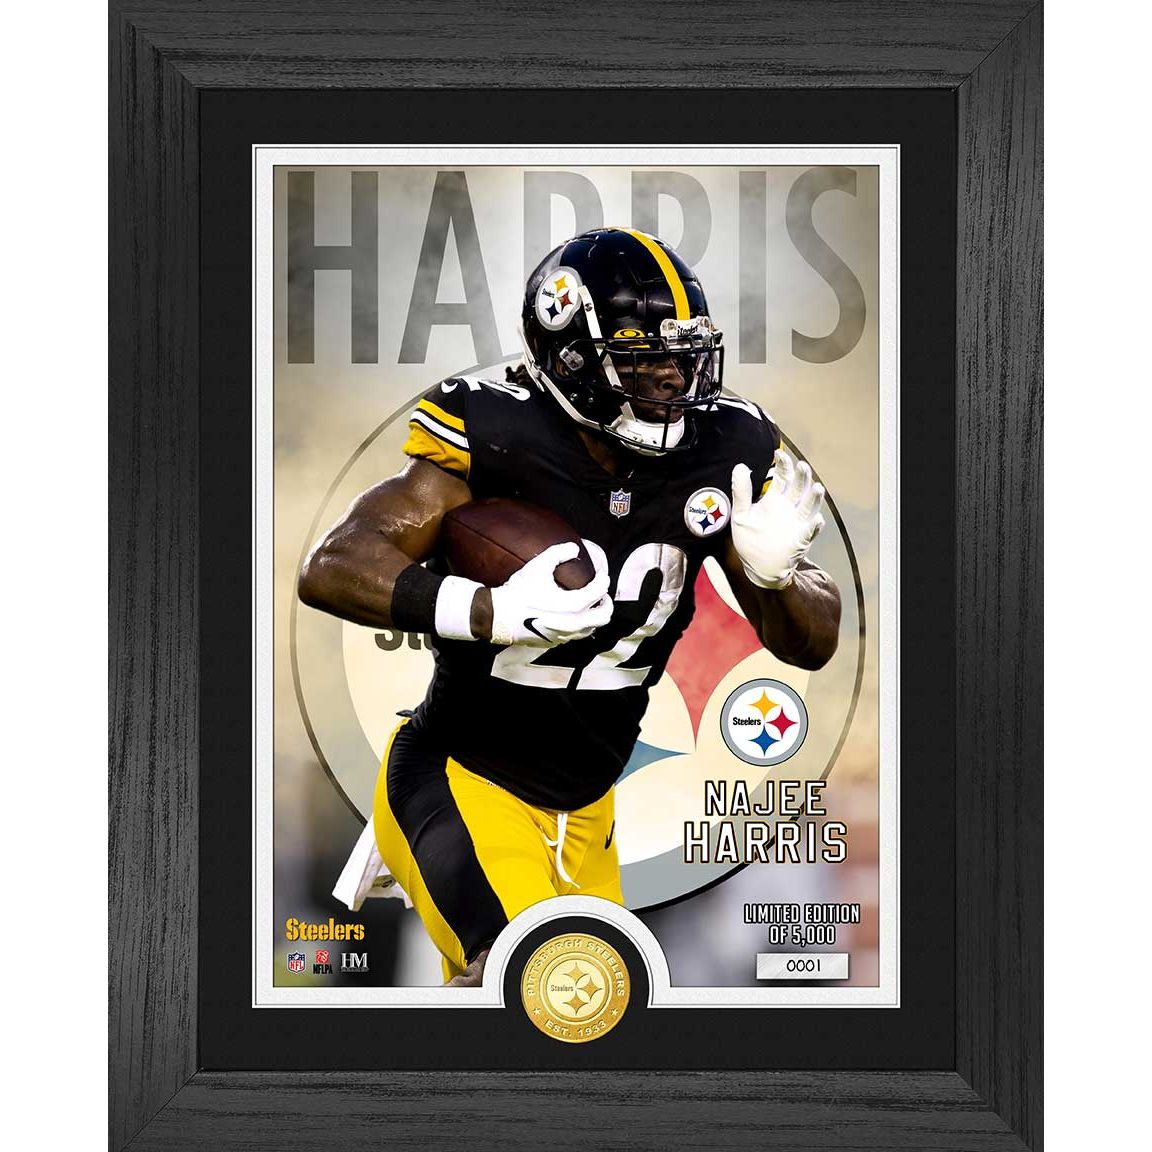 Najee Harris Pittsburgh Steelers Rookie Bronze Coin Photo Mint